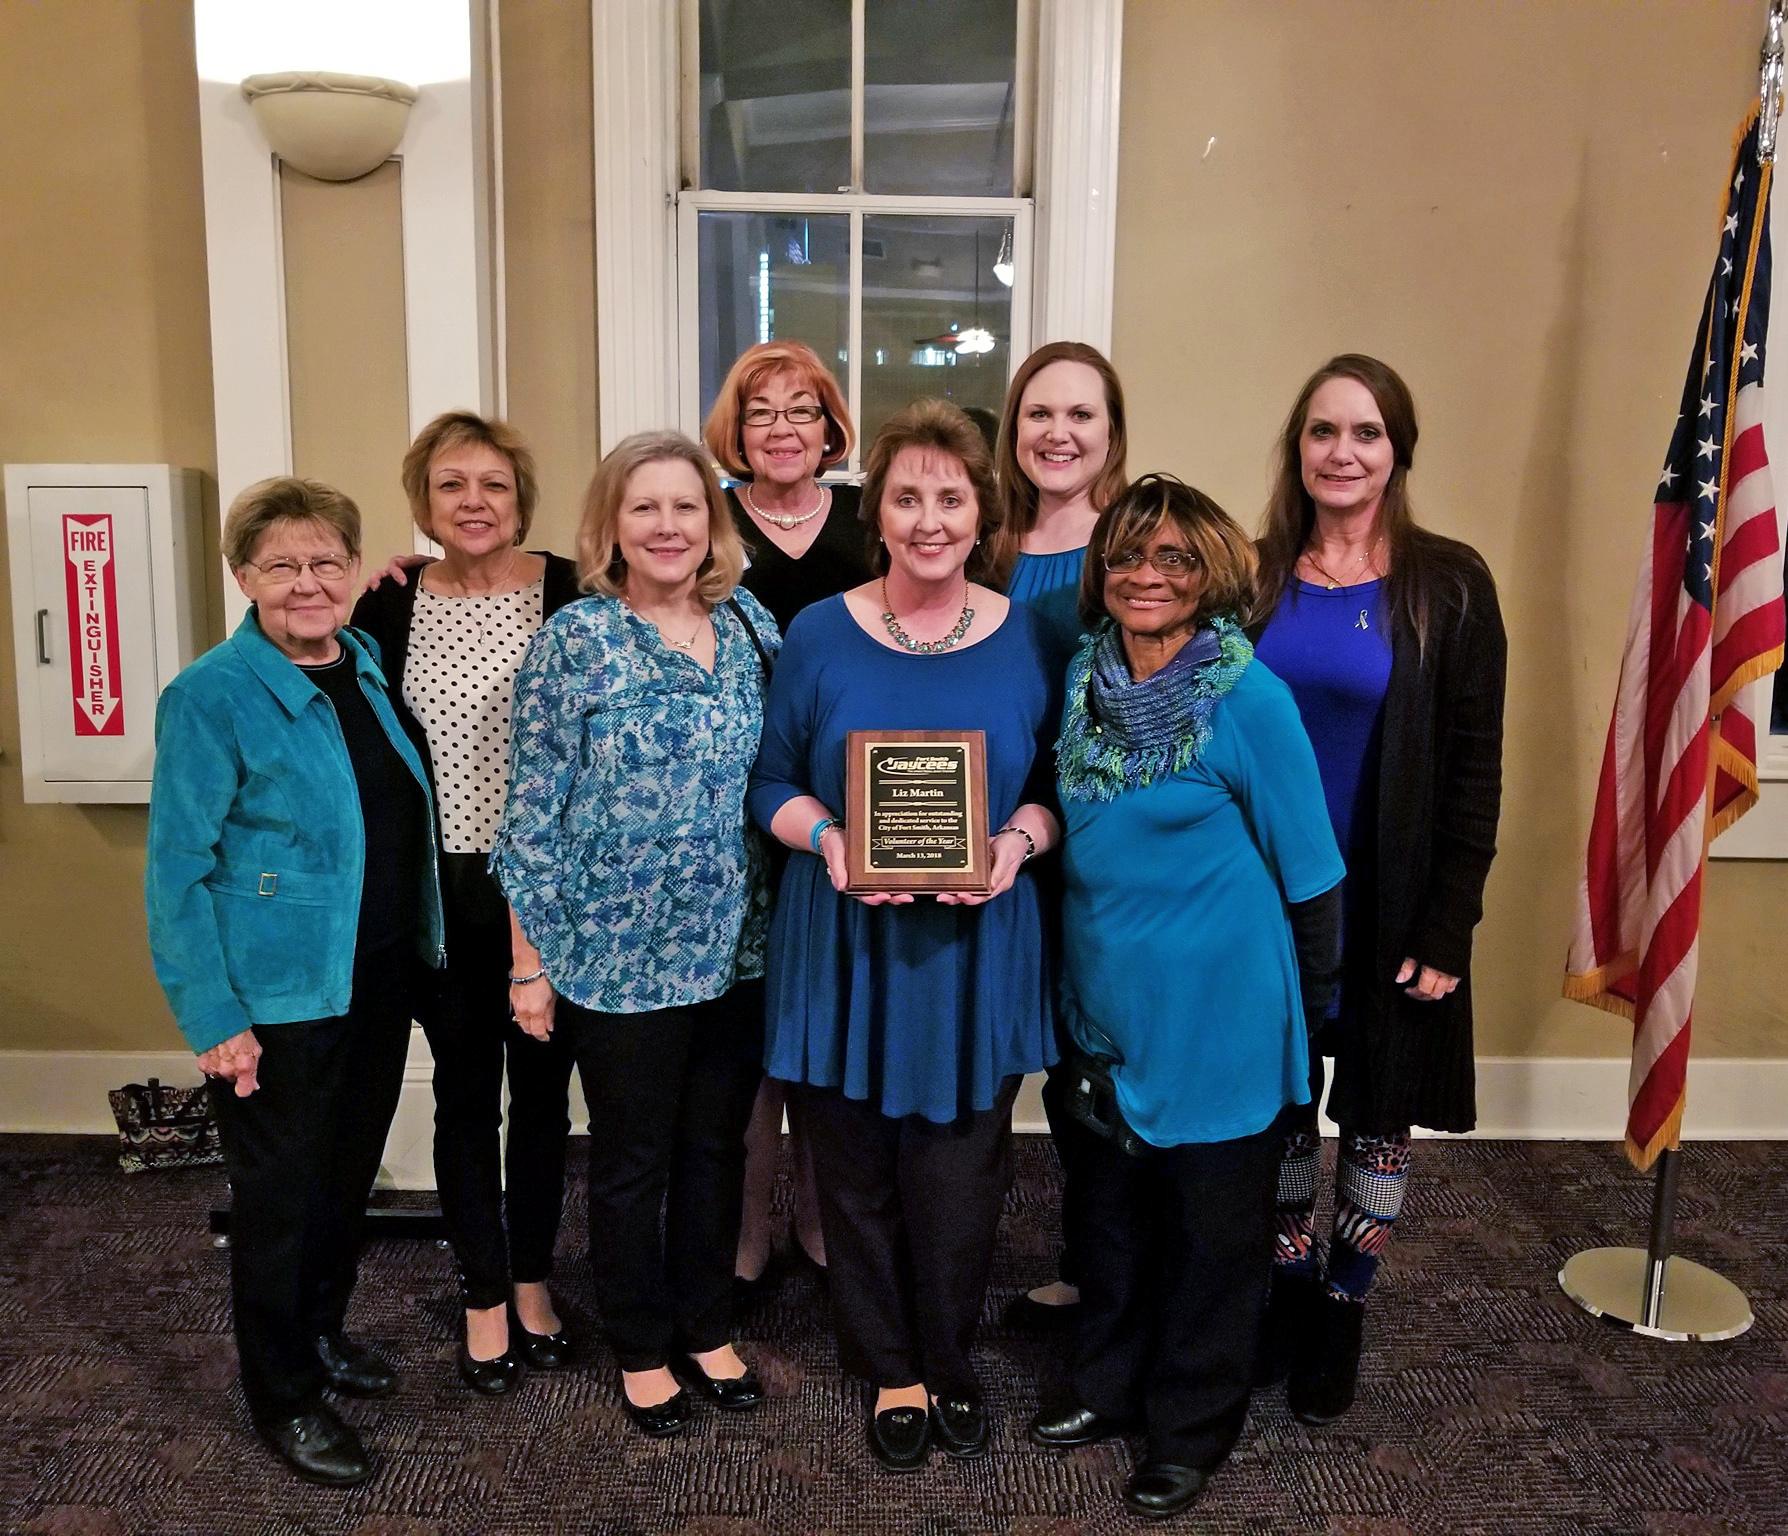 Liz Martin Volunteer of the Year Award Junior Chamber Fort Smith Arkansas River Valley Ovarian Cancer Alliance RVOCA